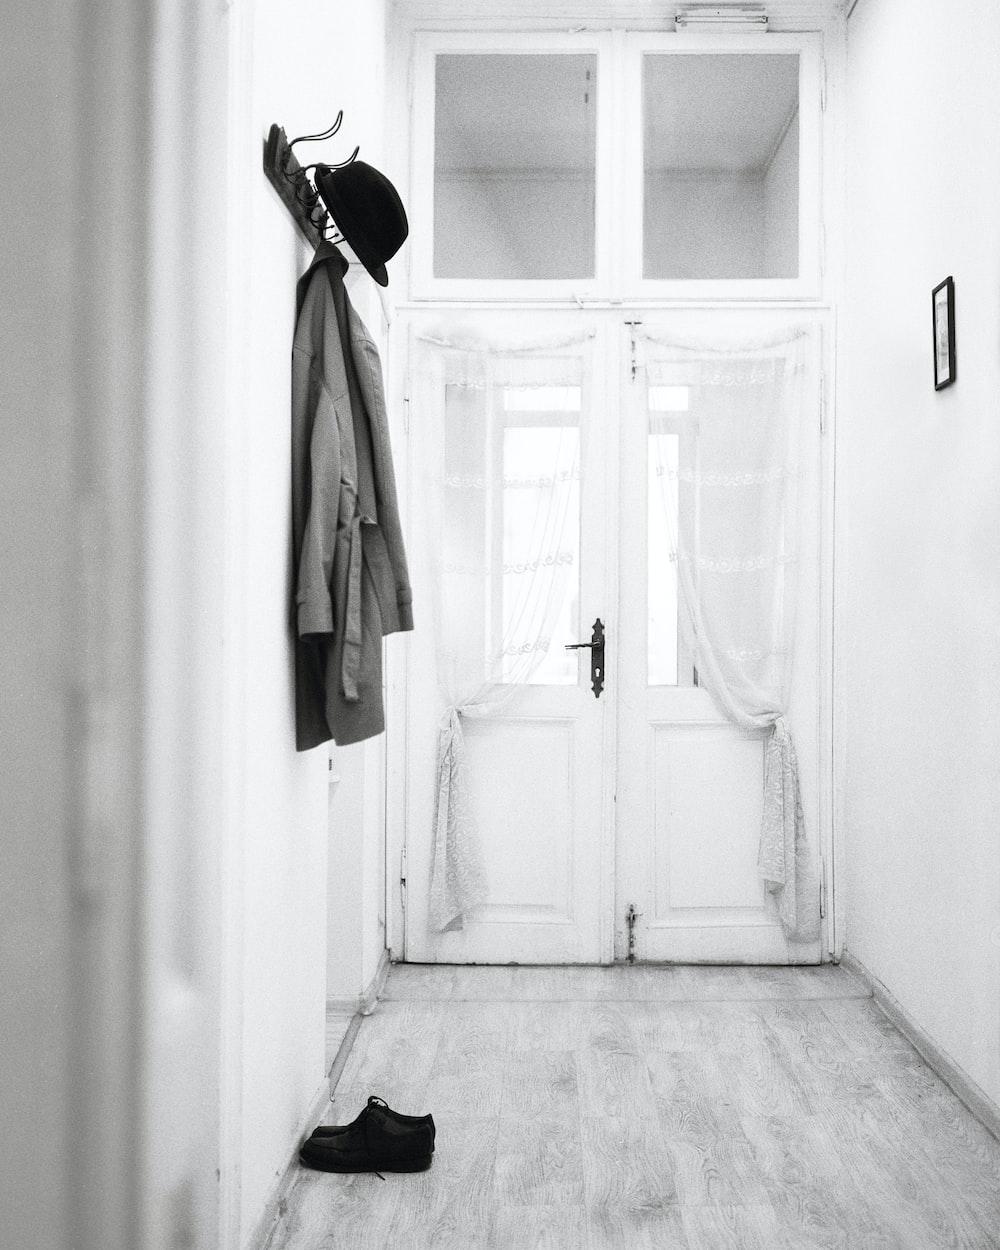 coat hanged on wall hooks